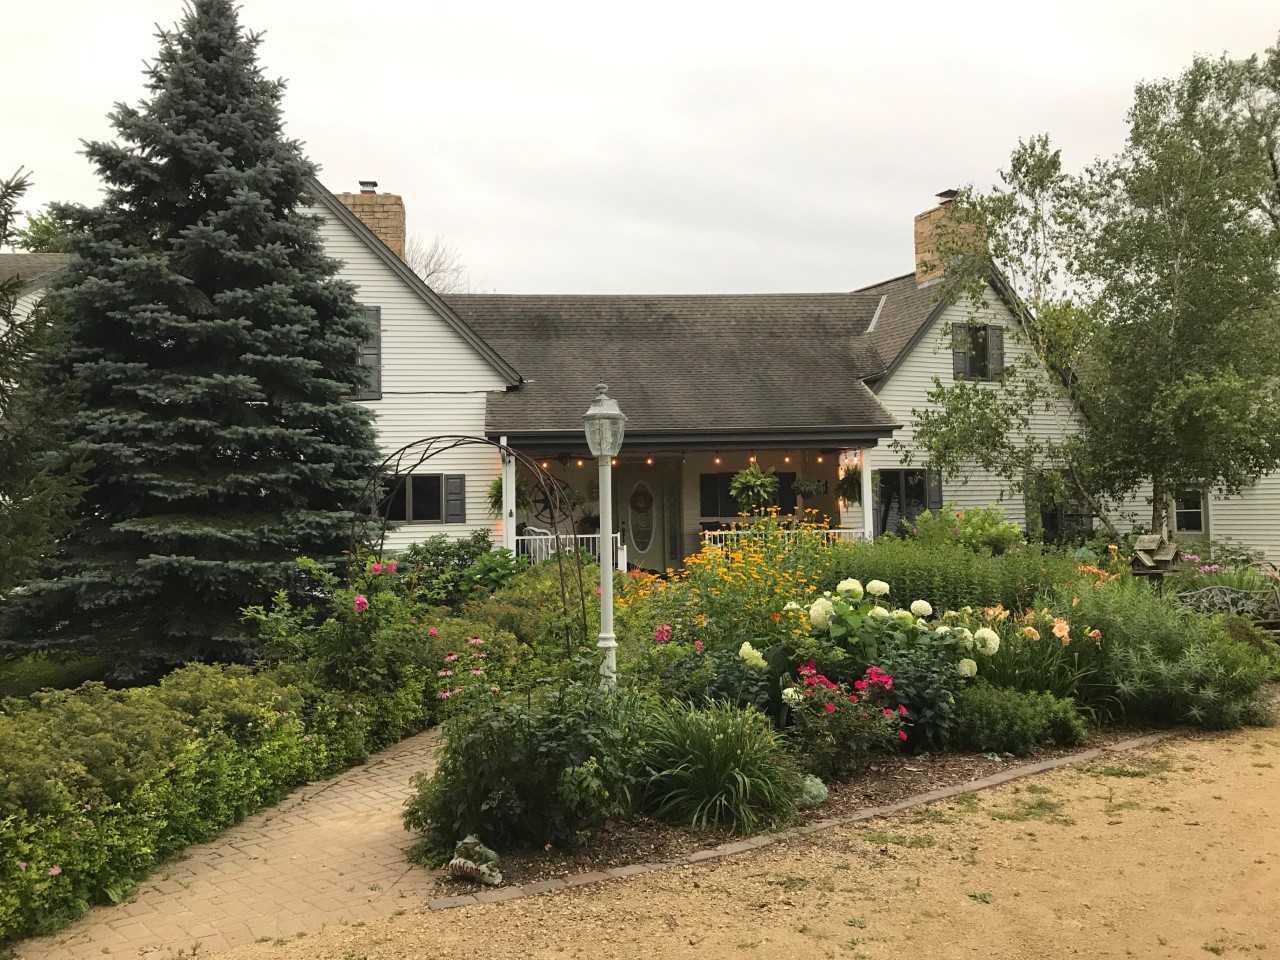 Maidenwood Lodge 072717